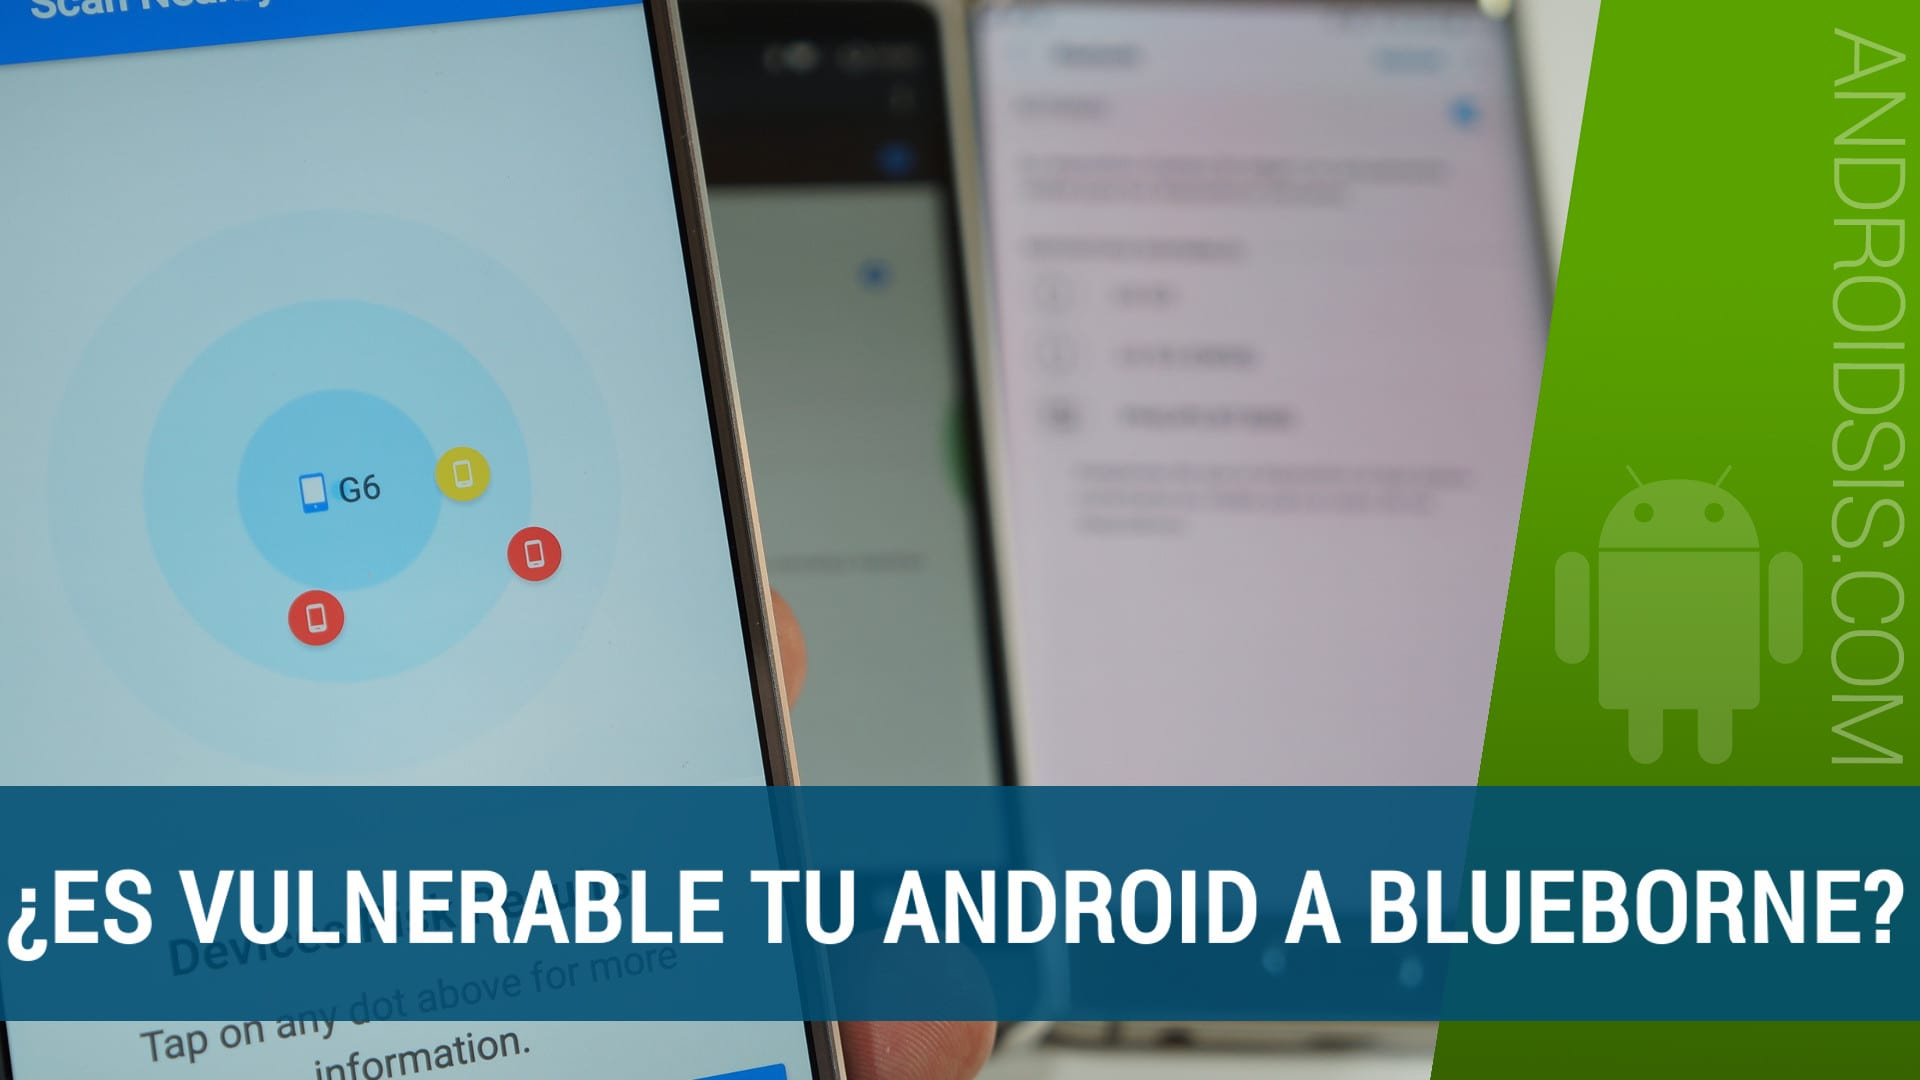 Blueborne comprobar vulnerabilidad Android